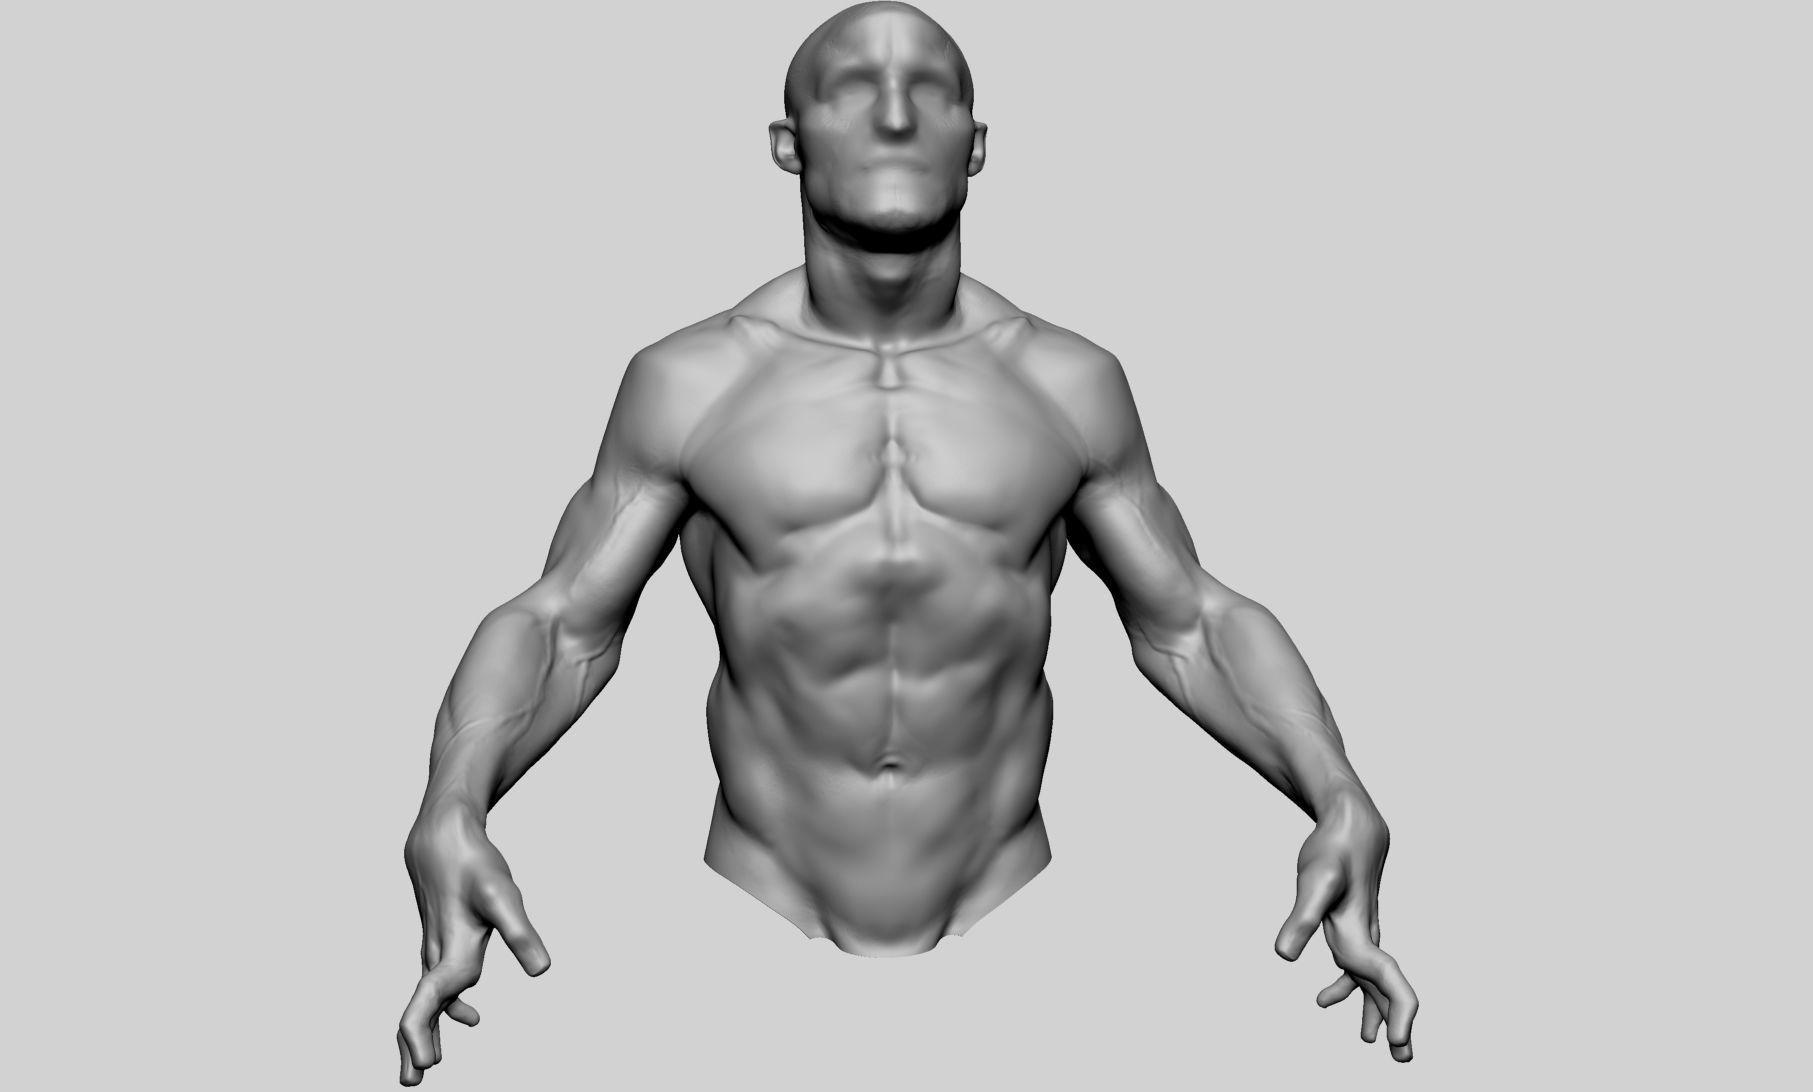 Male Upper Body 02 3D Model OBJ ZTL | CGTrader.com